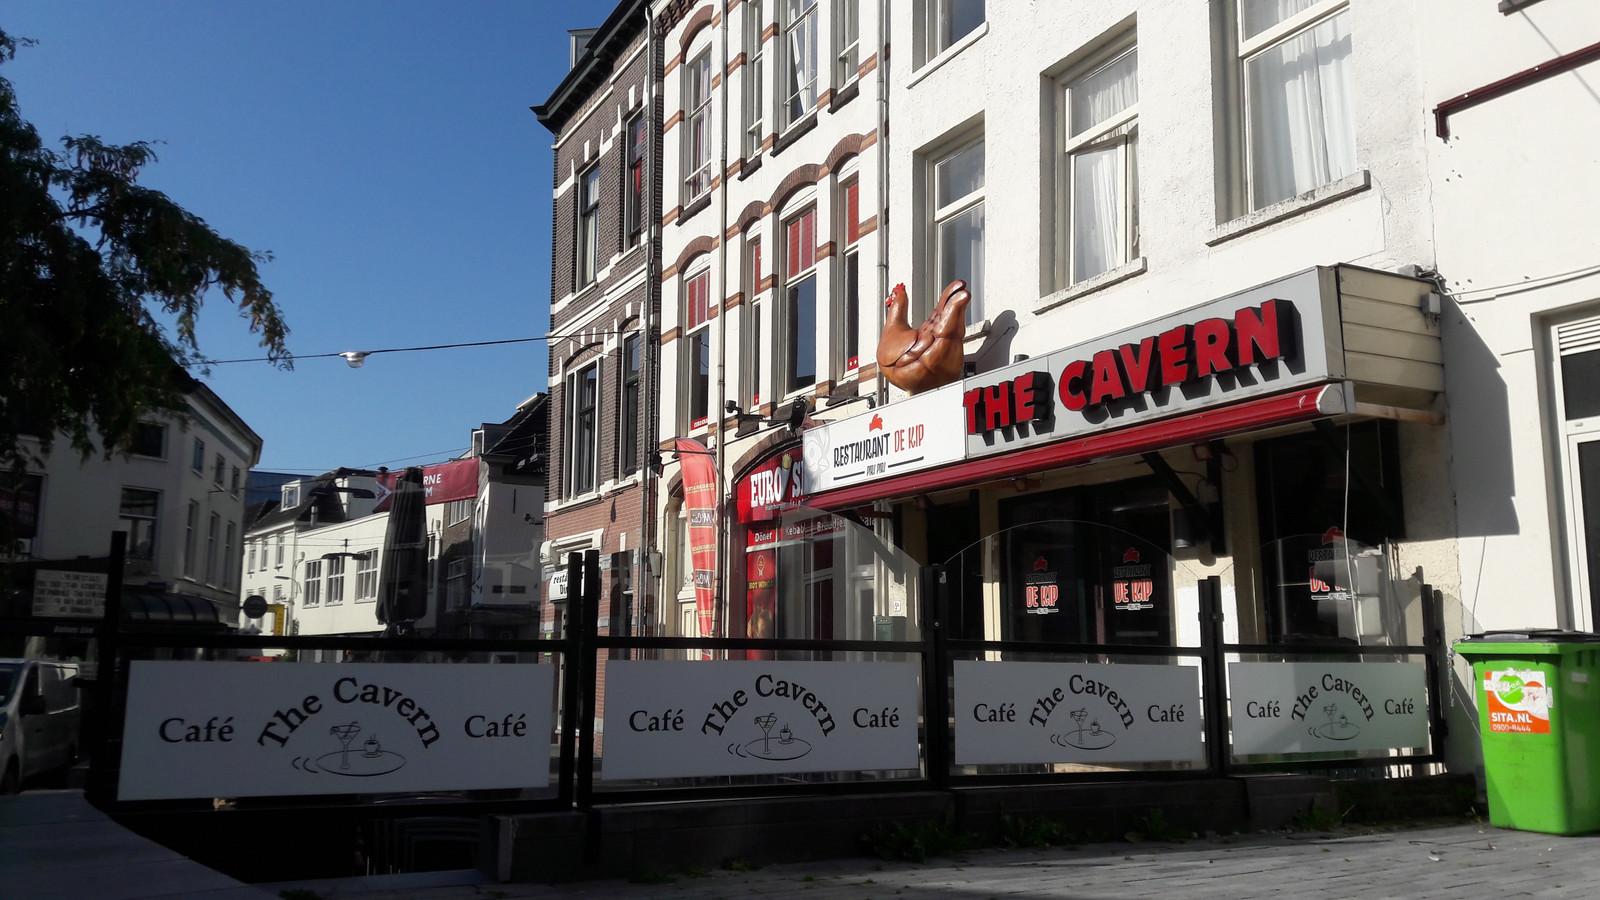 Café The Cavern aan de Arnhemse Korenmarkt.